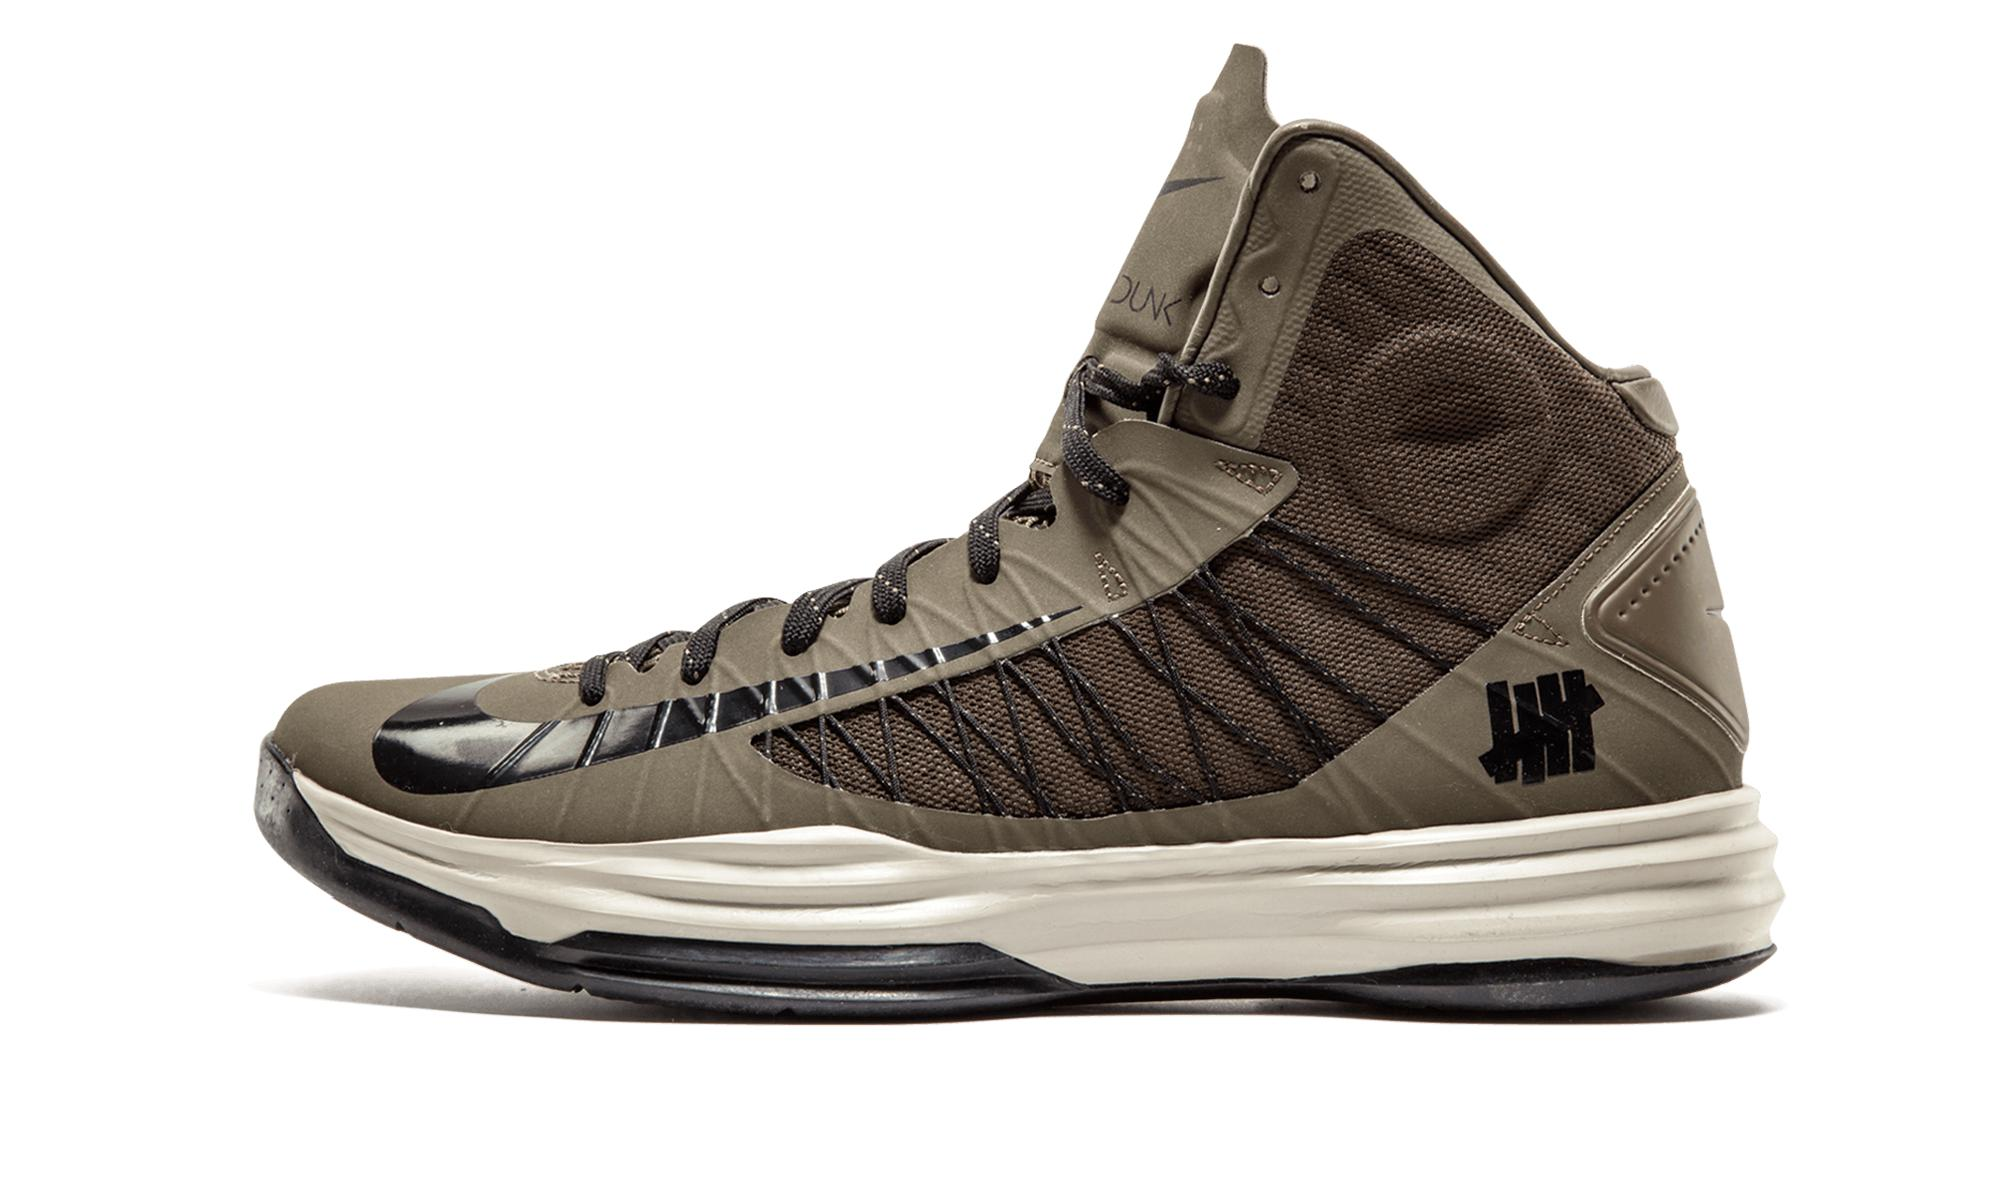 647e20aa8383 Nike Hyperdunk Undftd Sp for Men - Save 10% - Lyst